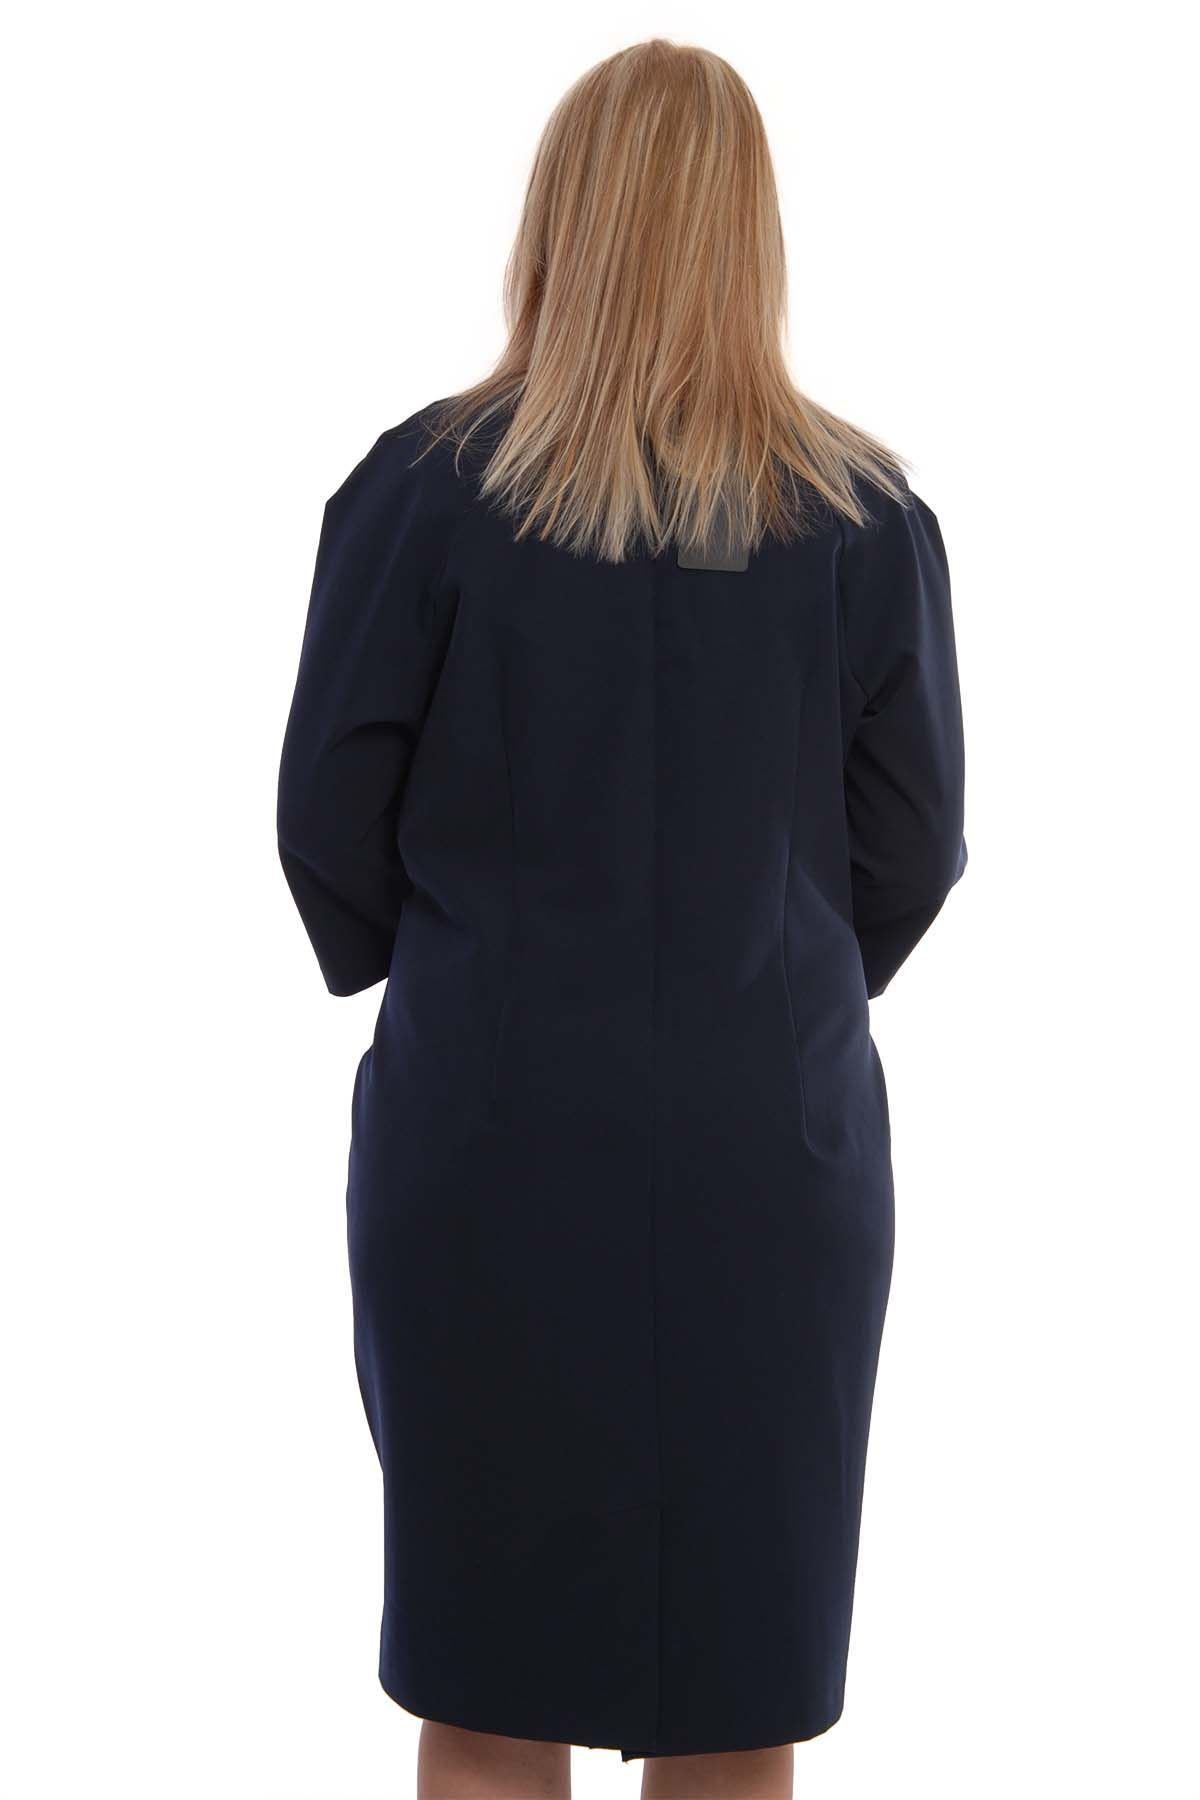 Lacivert Taşlı Elbise H9-75598